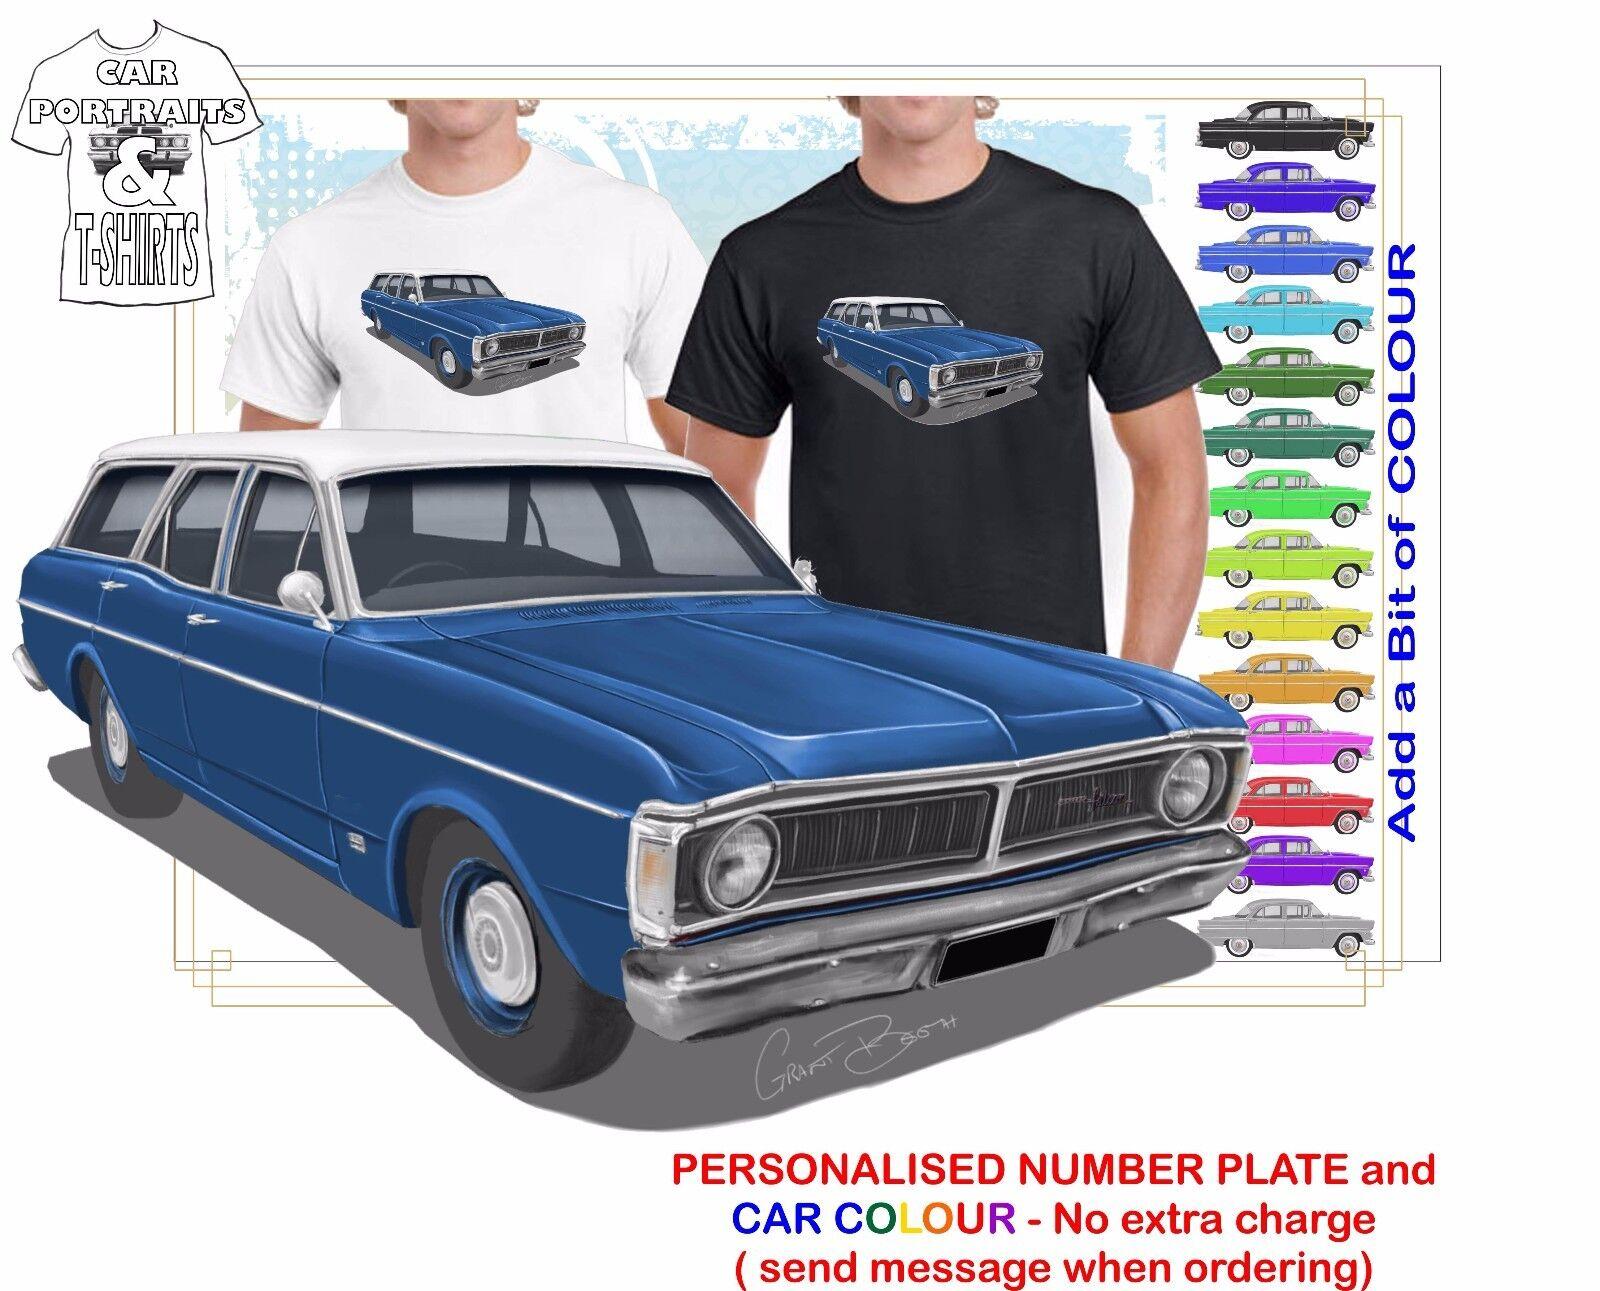 CLASSIC 70-72 XY FALCON WAGON ILLUSTRATED T-SHIRT MUSCLE RETRO SPORT CAR